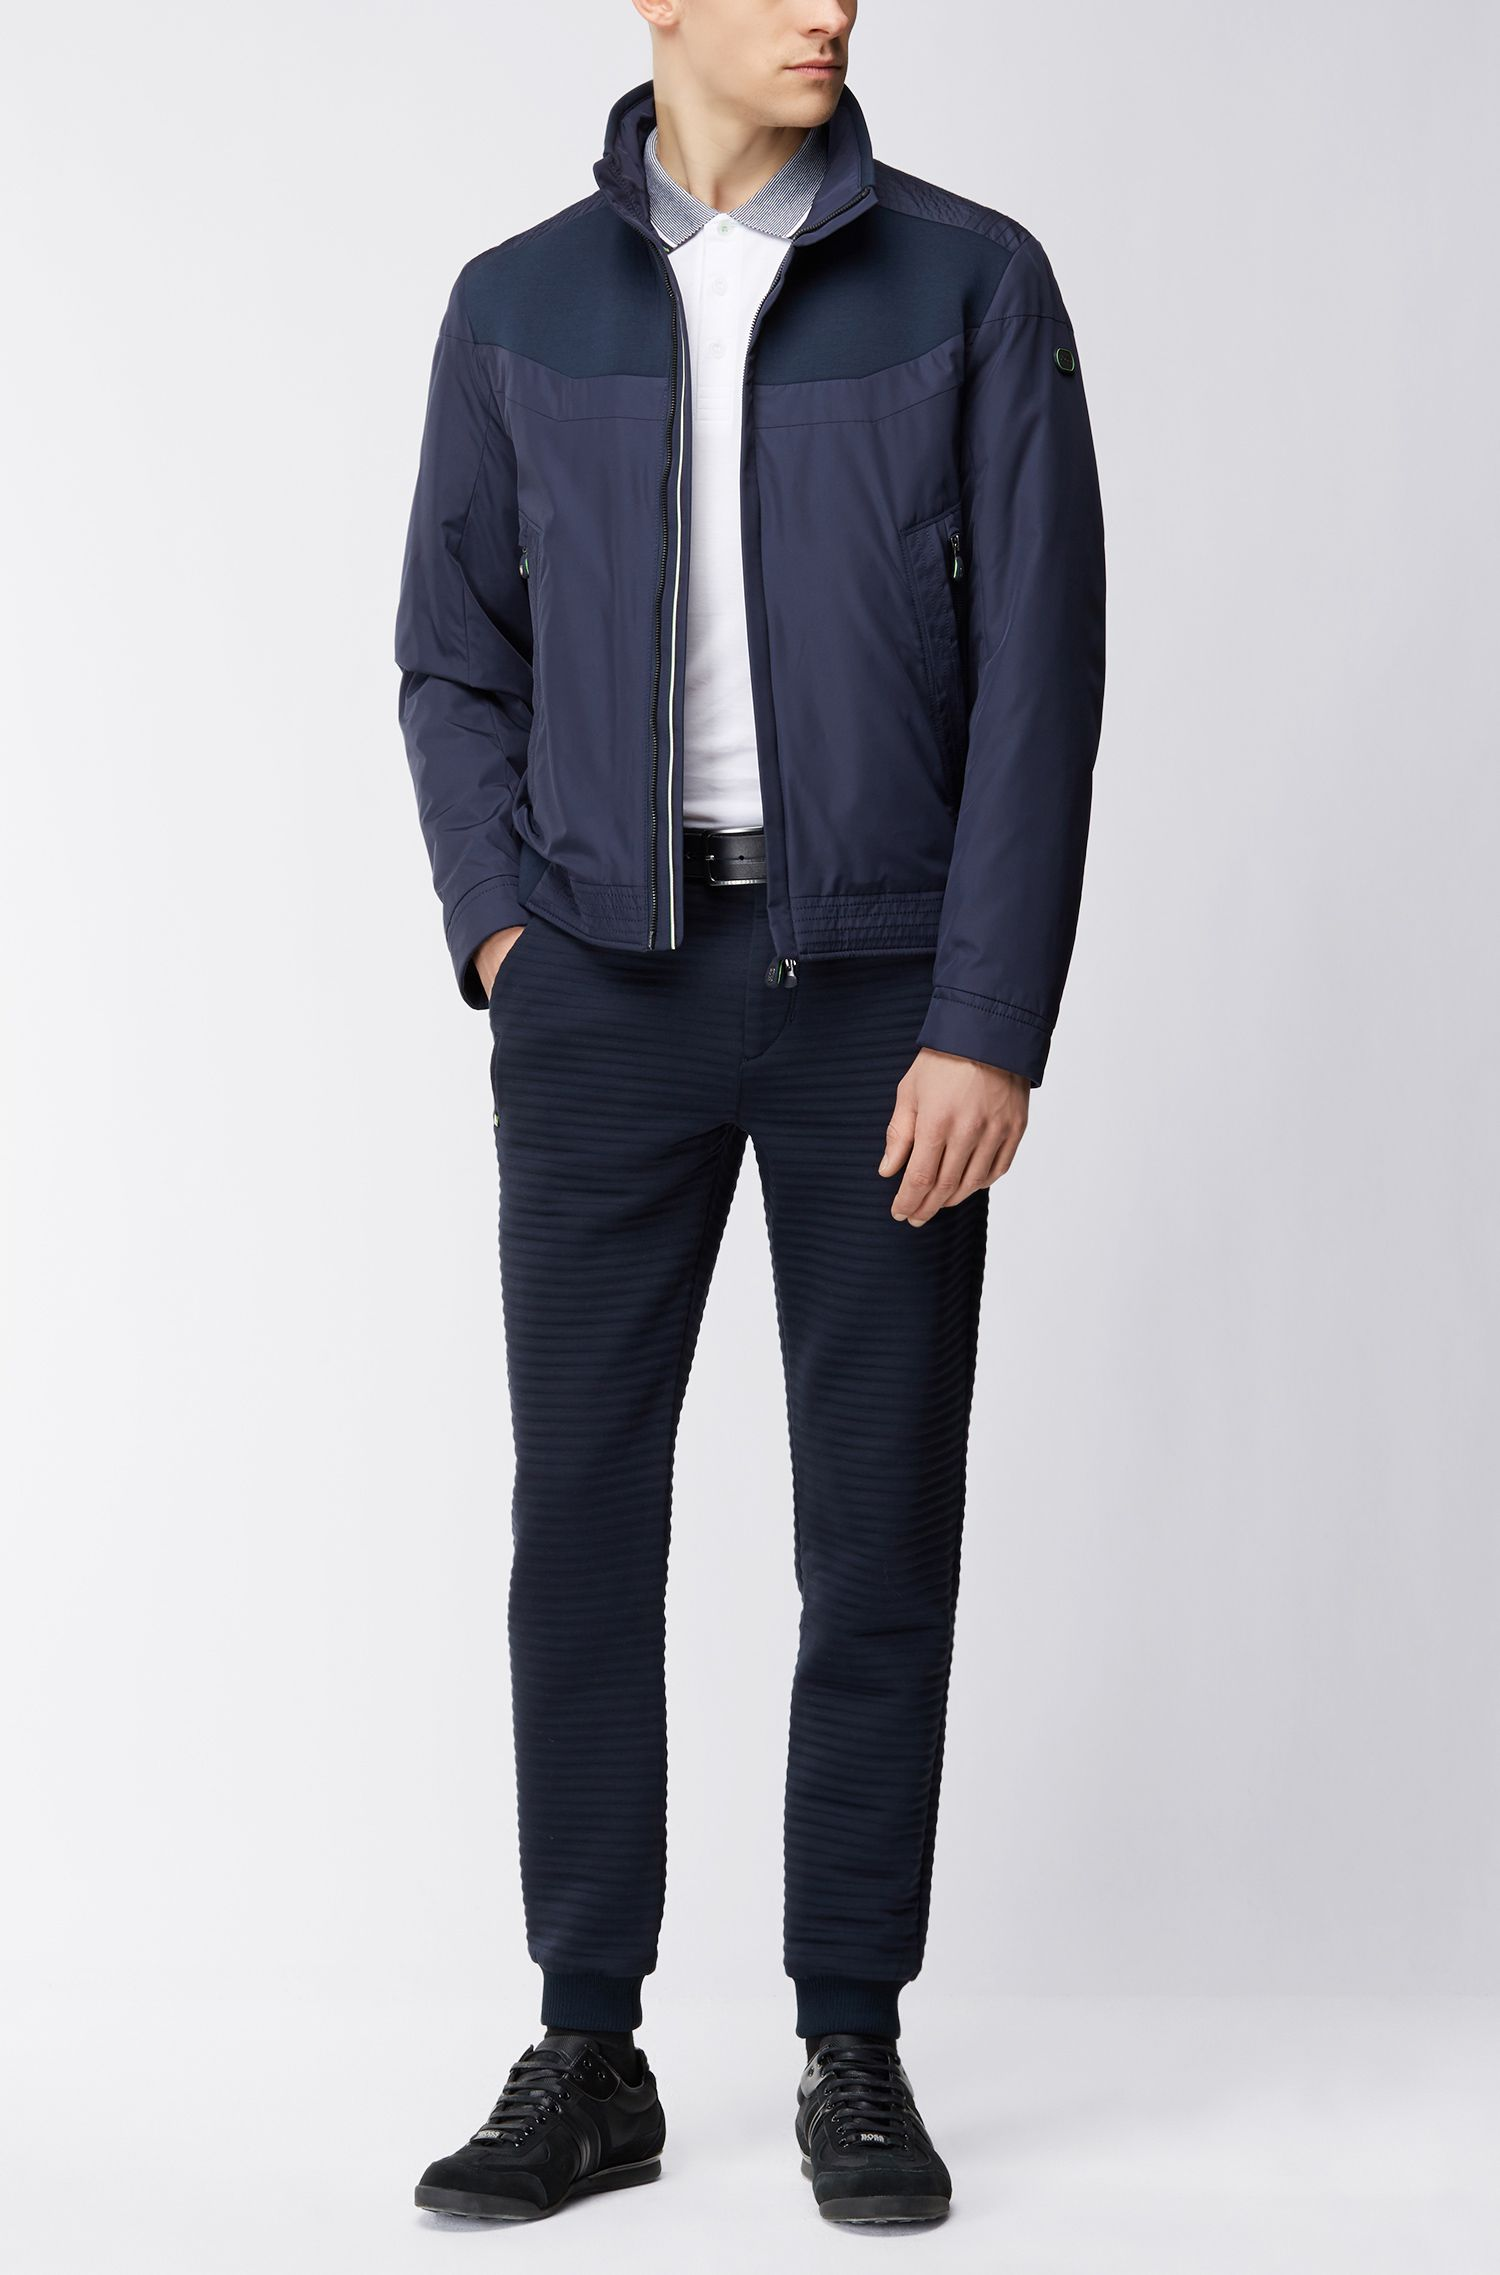 Cotton Piqué Polo Shirt, Regular Fit | Paddos, White